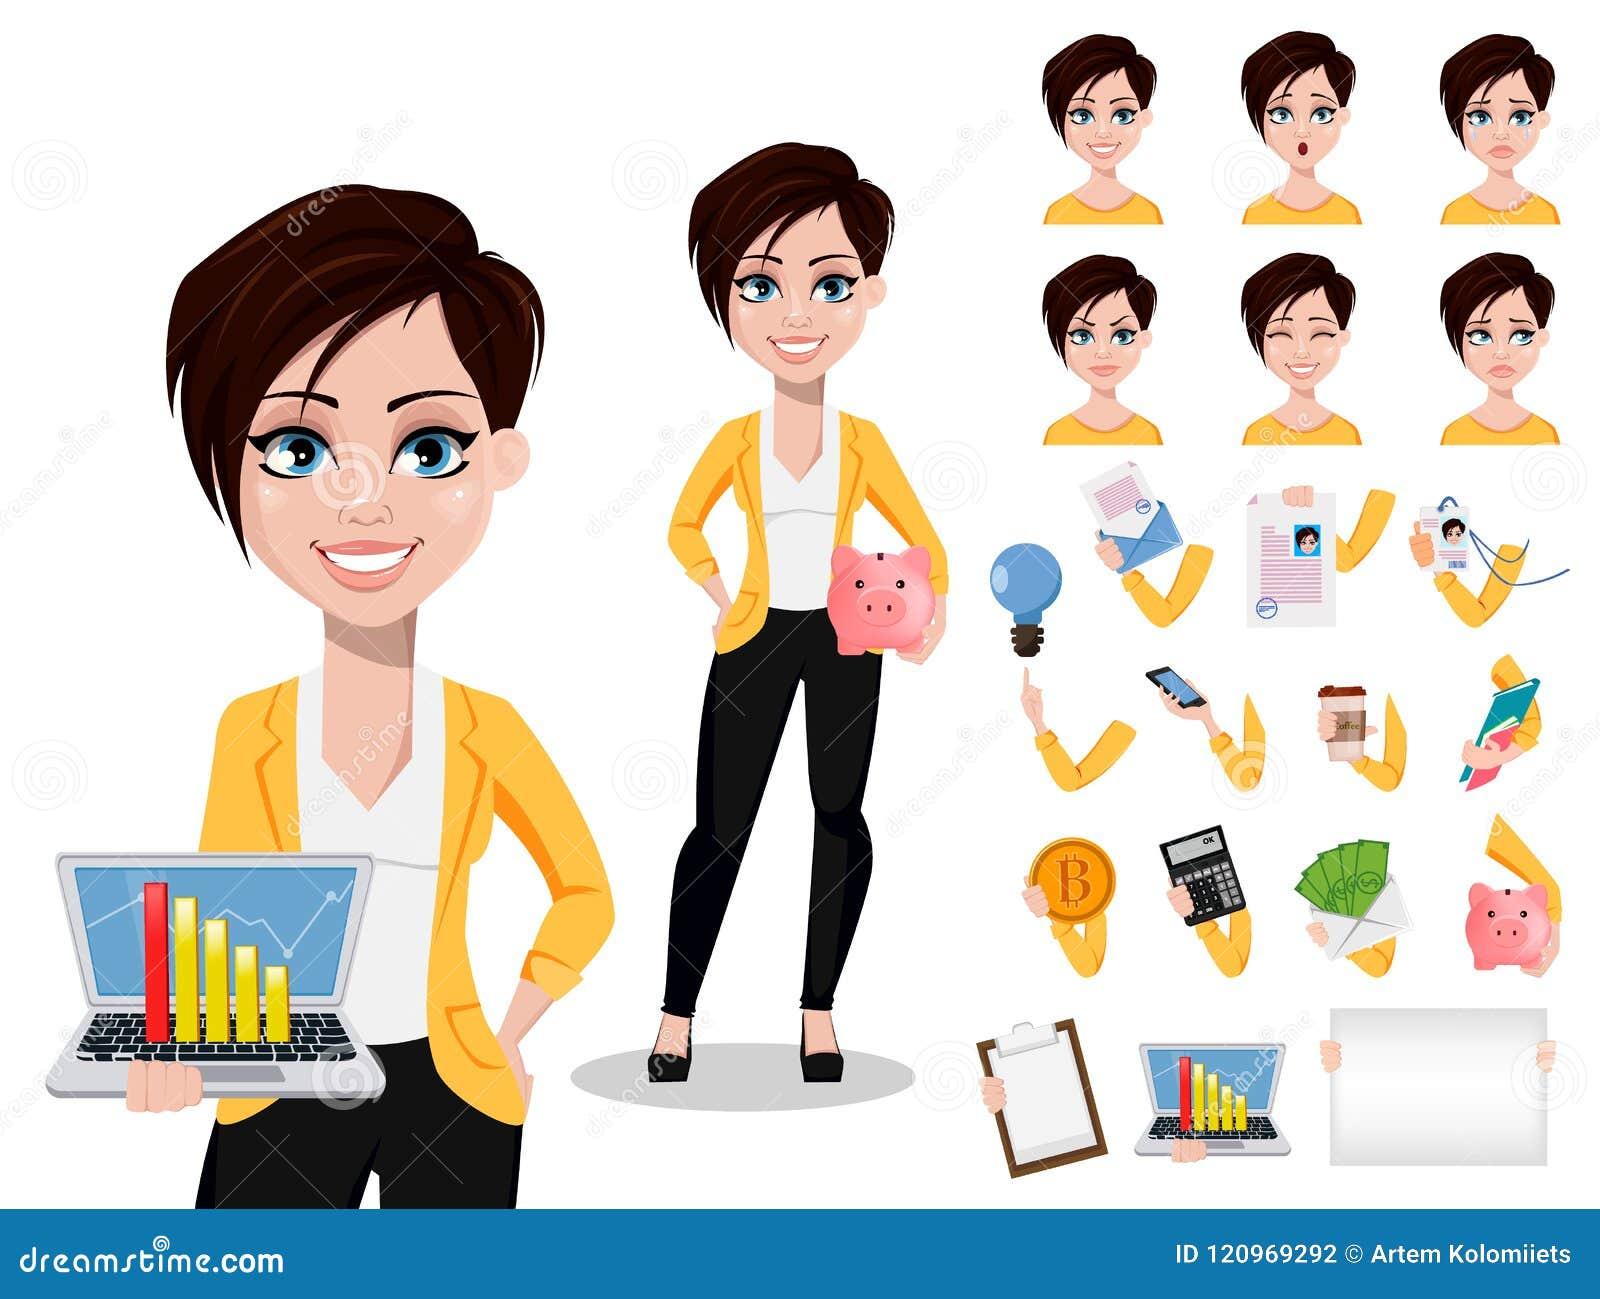 Bedrijfsvrouw, freelancer, bankier Mooie dame in vrijetijdskleding